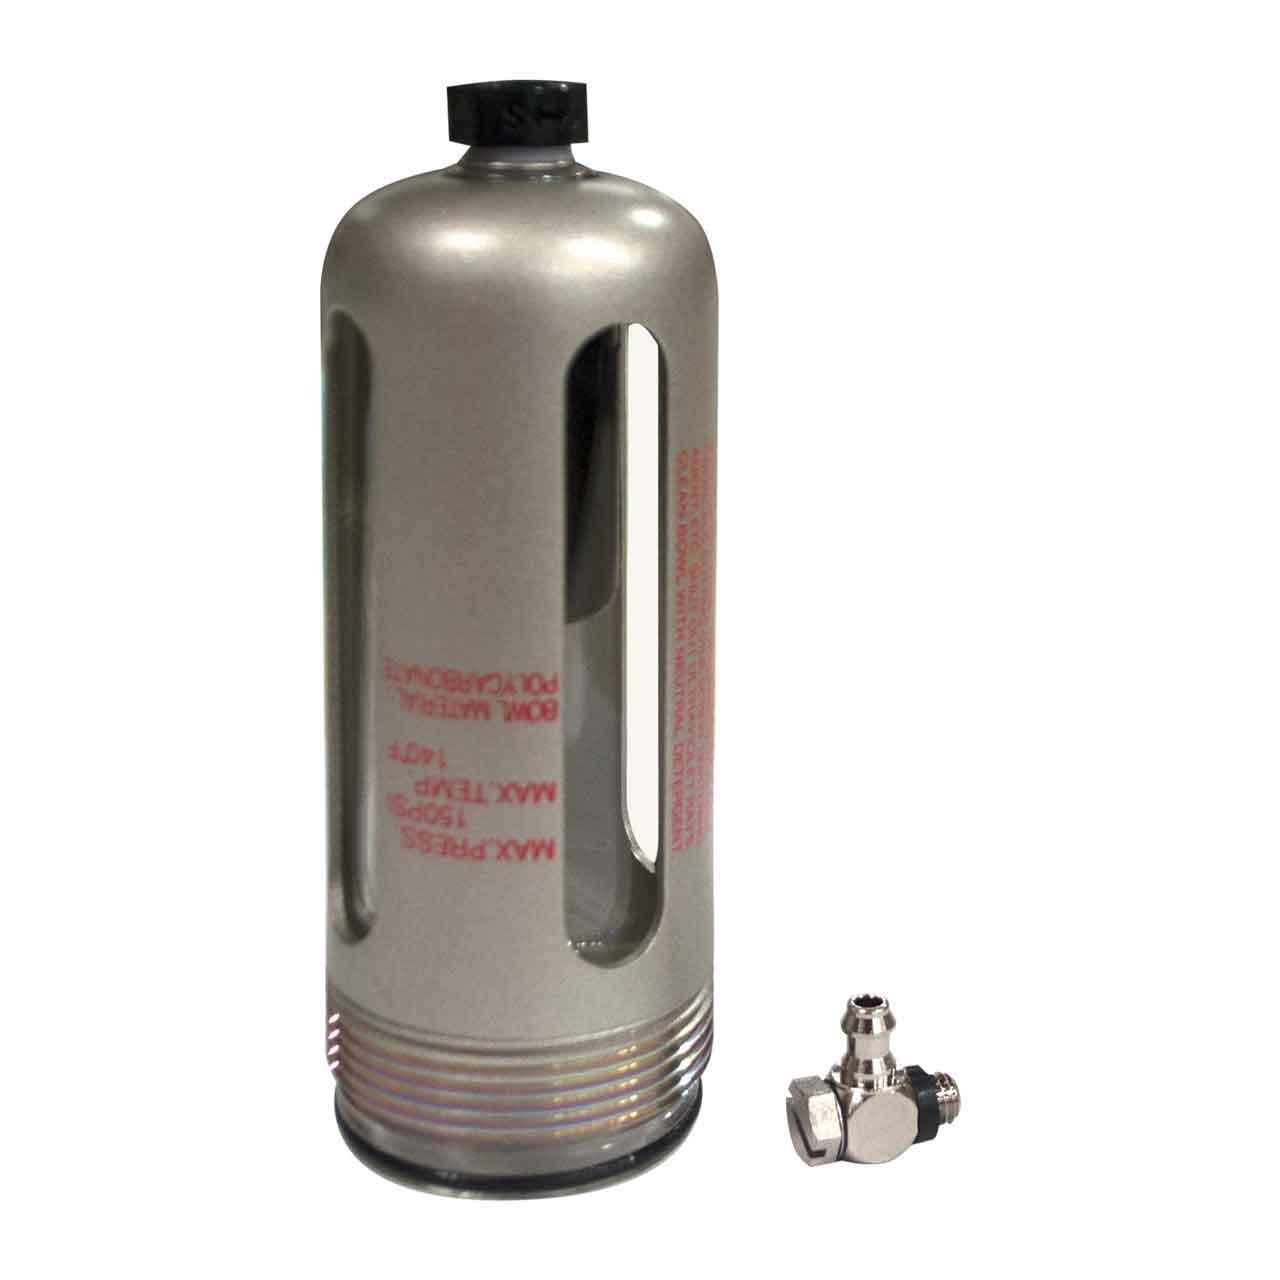 Hypertherm 428258 Kit PMX45 Filter Bowl Replacement